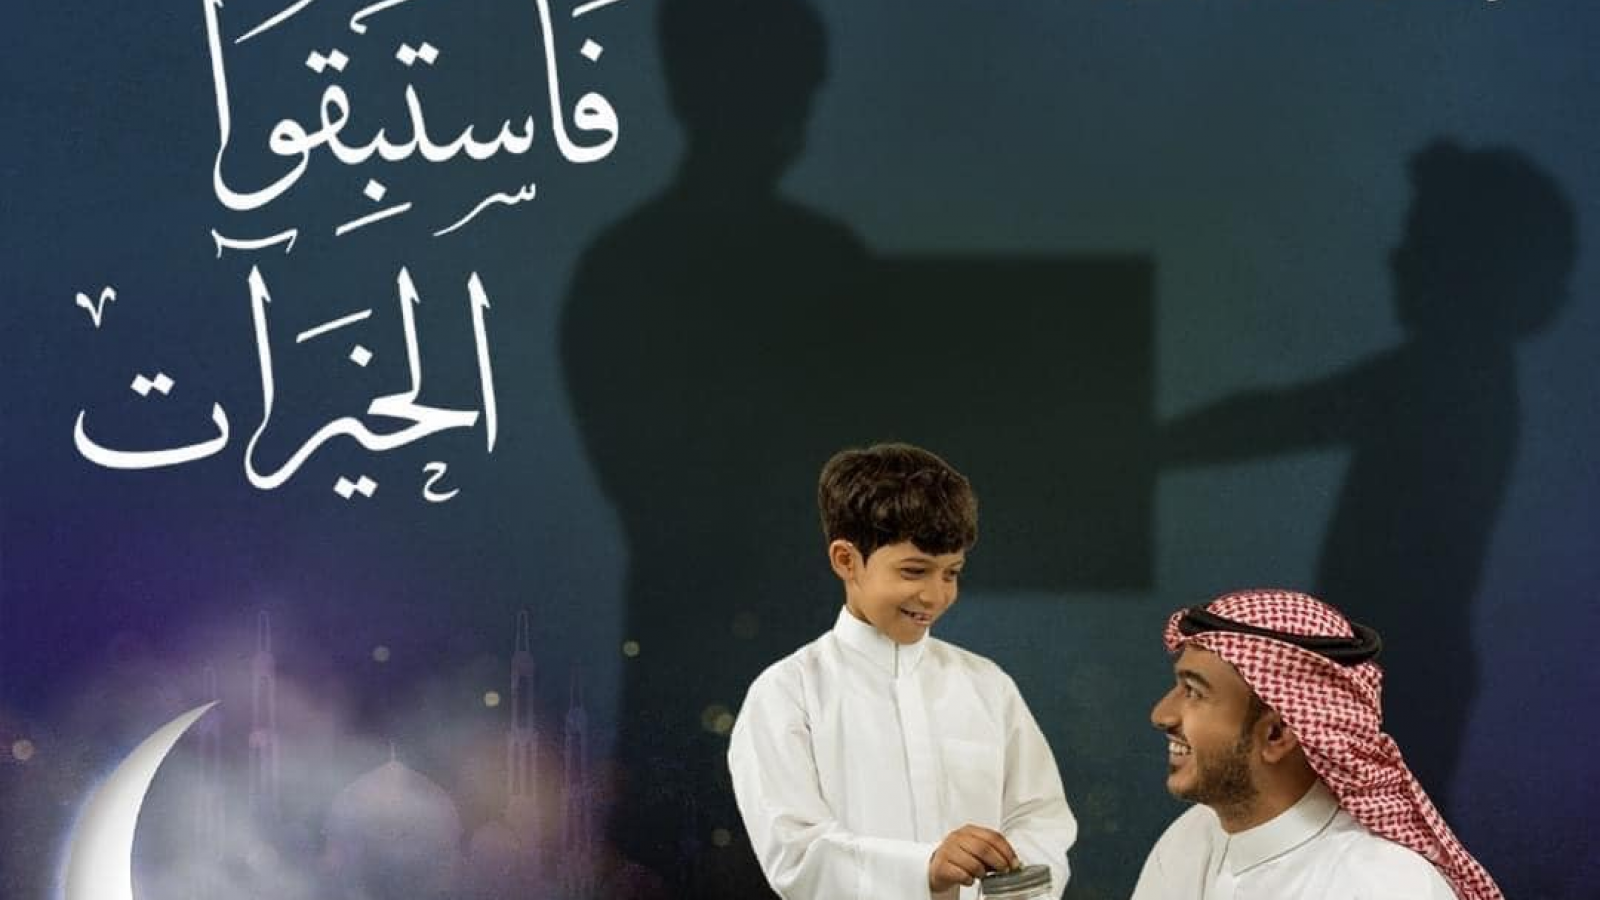 Qatar Red Crescent Society launches Ramadan campaign